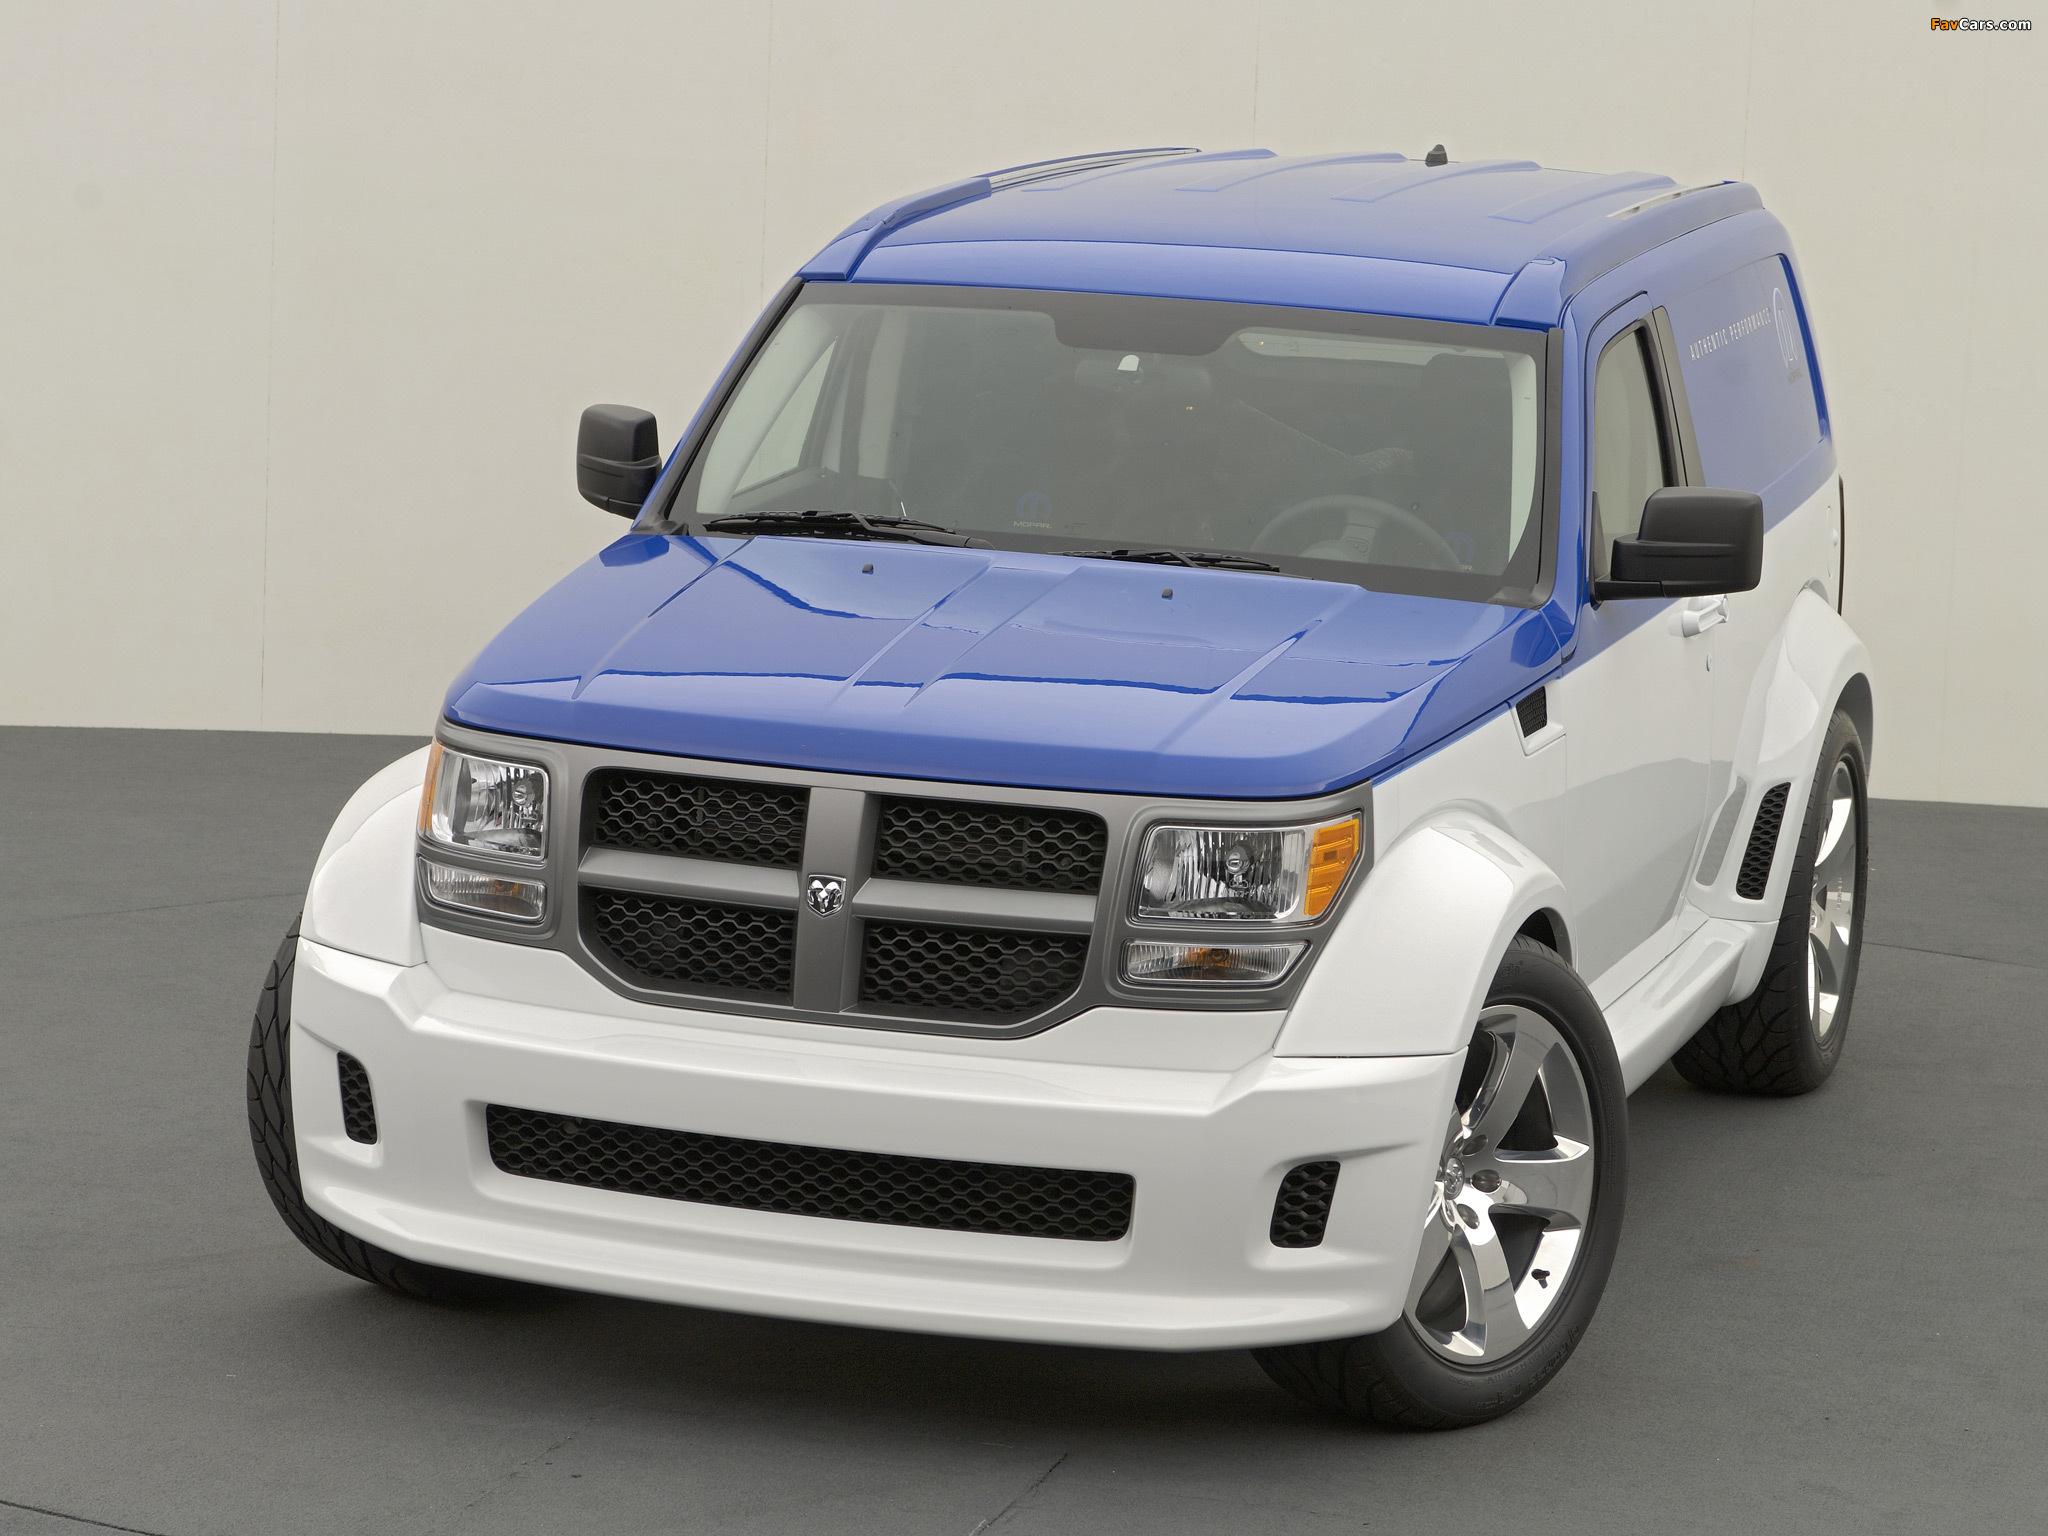 Dodge Nitro Panel Wagon Concept 2006 wallpapers (2048 x 1536)